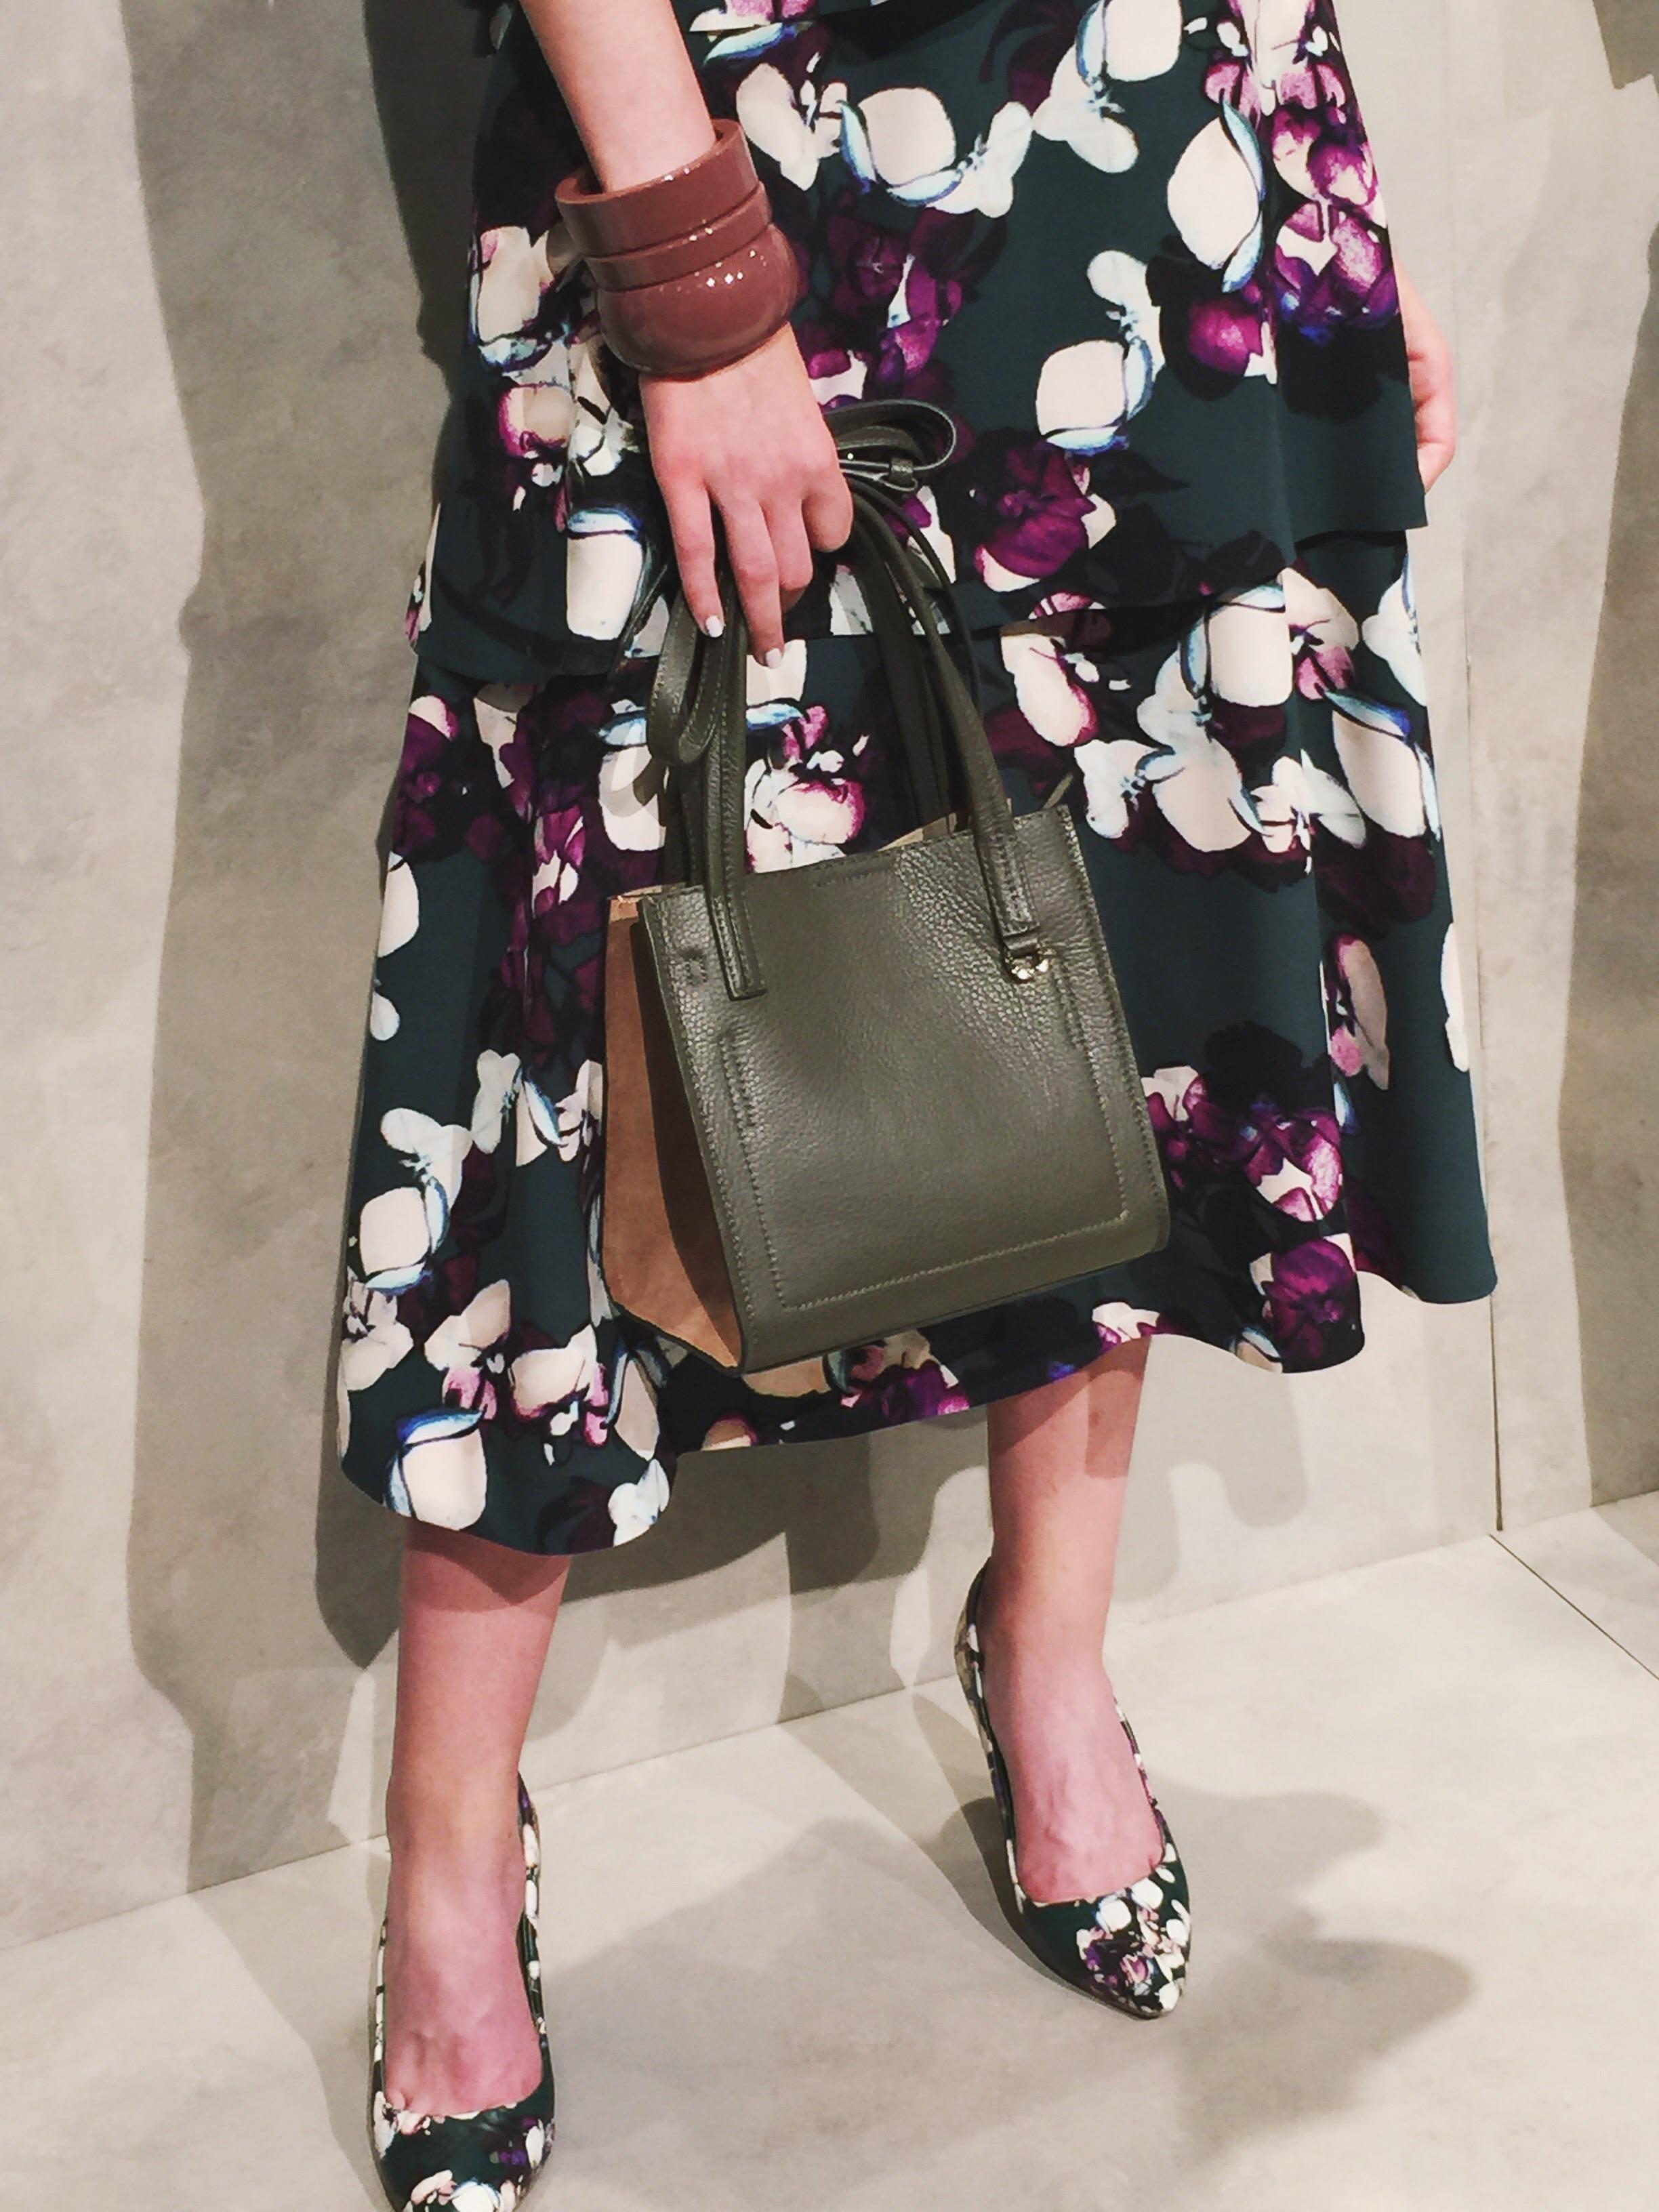 Big resin bangles and bold floral prints.